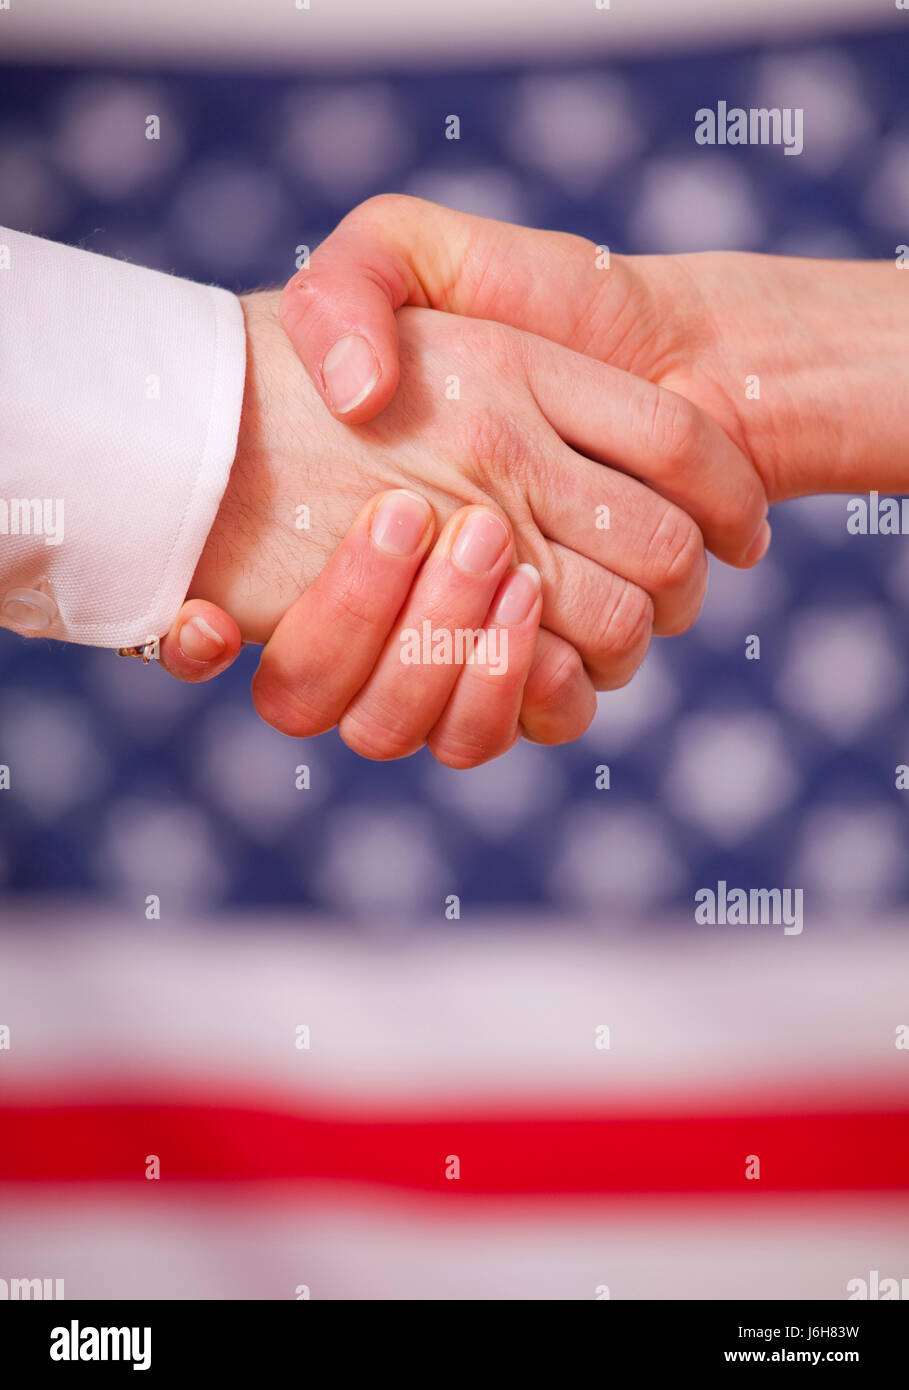 hand friendship american shake diplomacy success gesture hand friendship - Stock Image